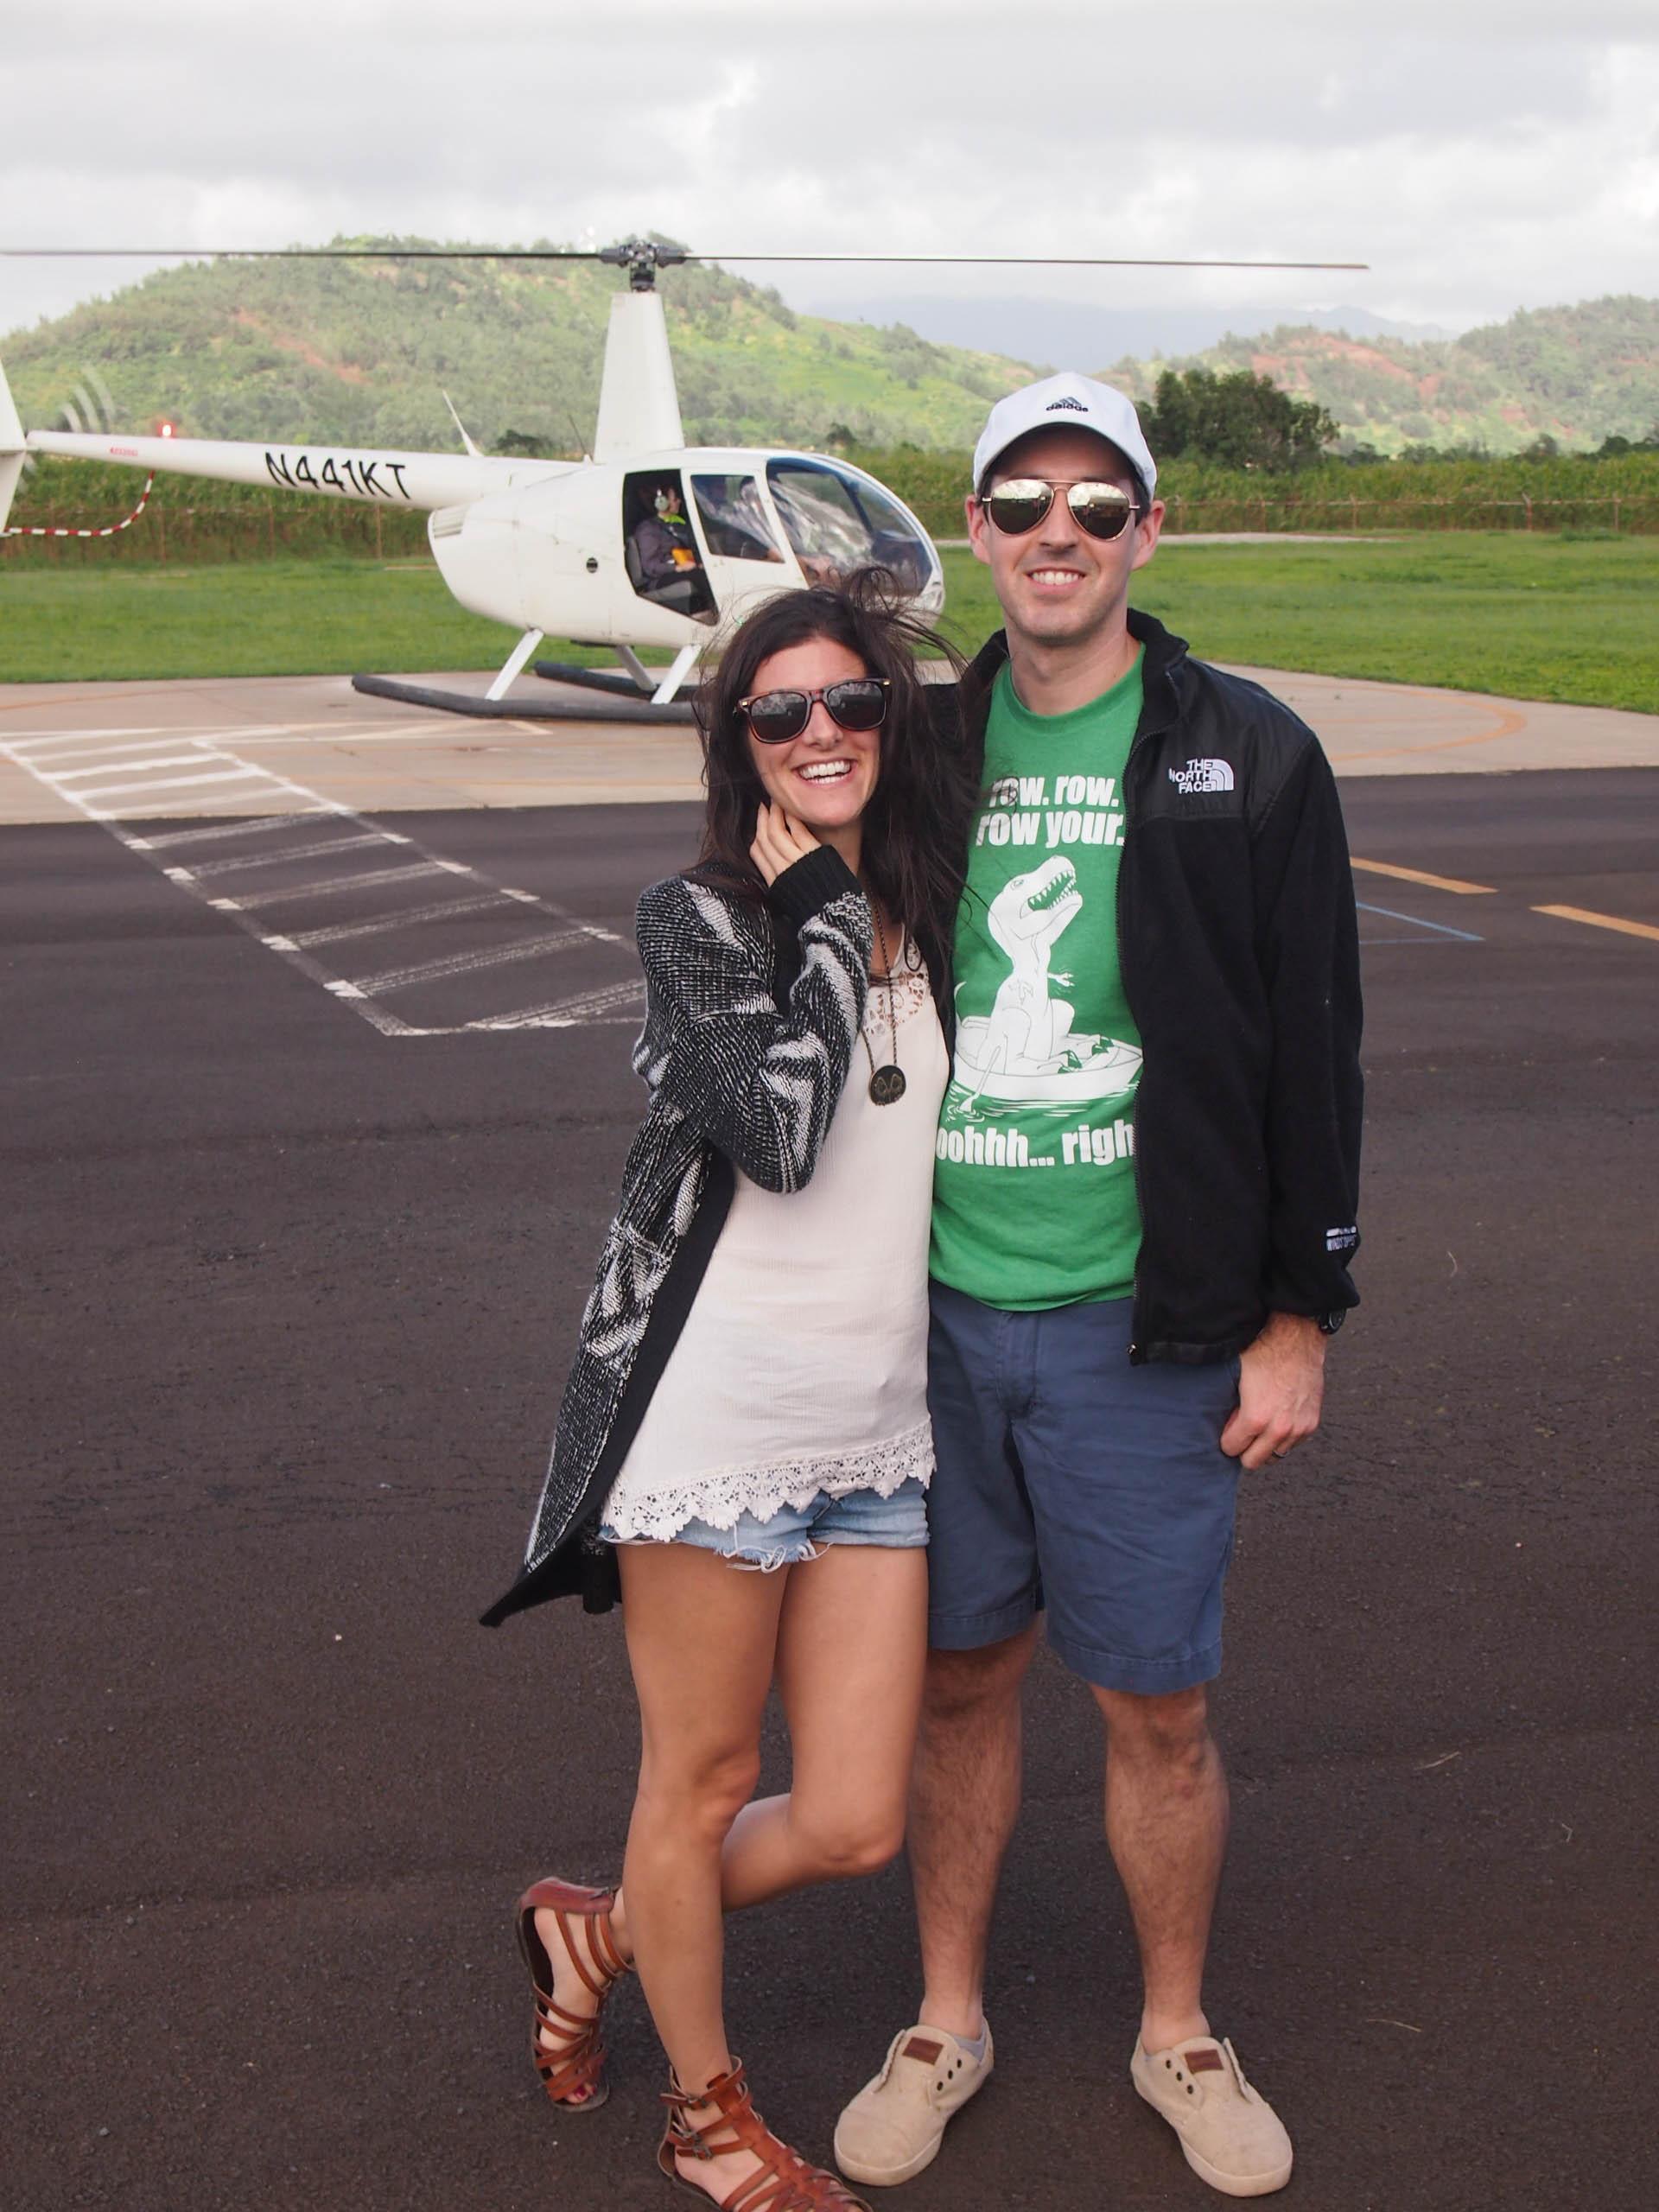 Mauna Loa Helicopter tours in Kauai